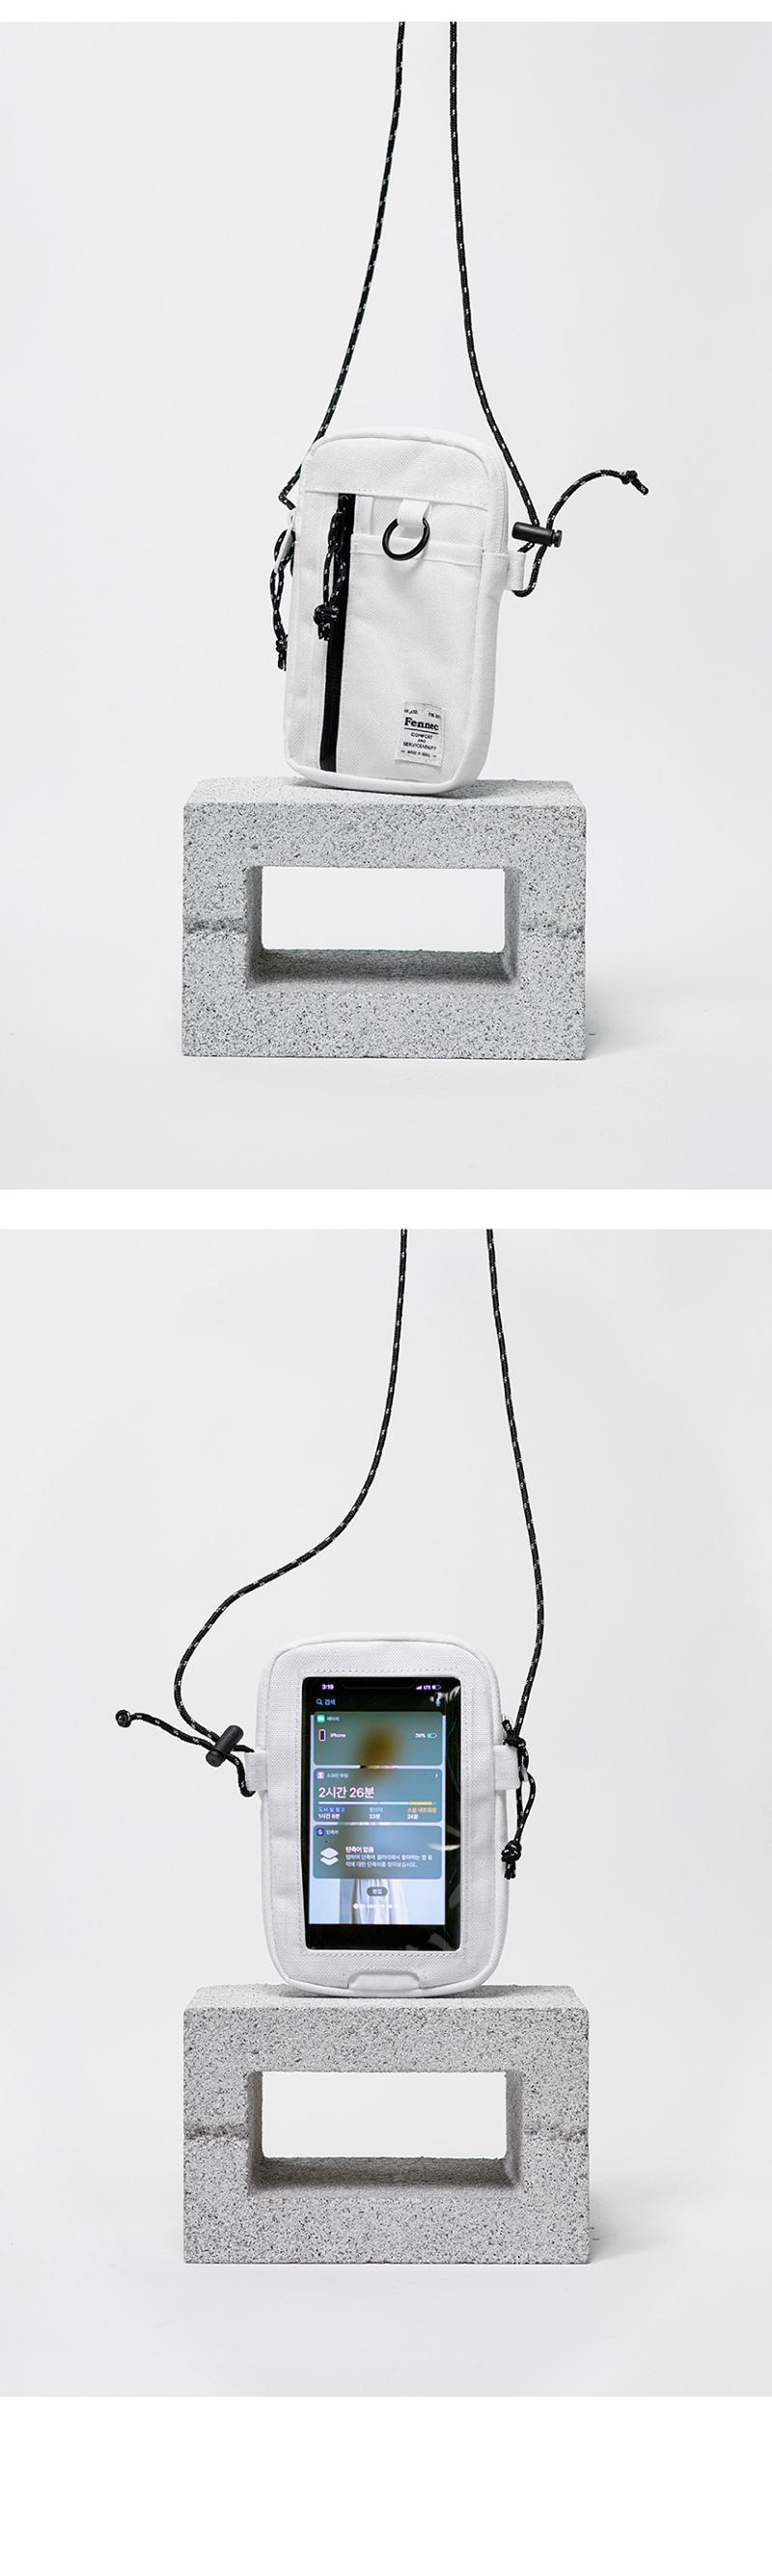 10x10-C_S-micro-bag-wh_03.jpg